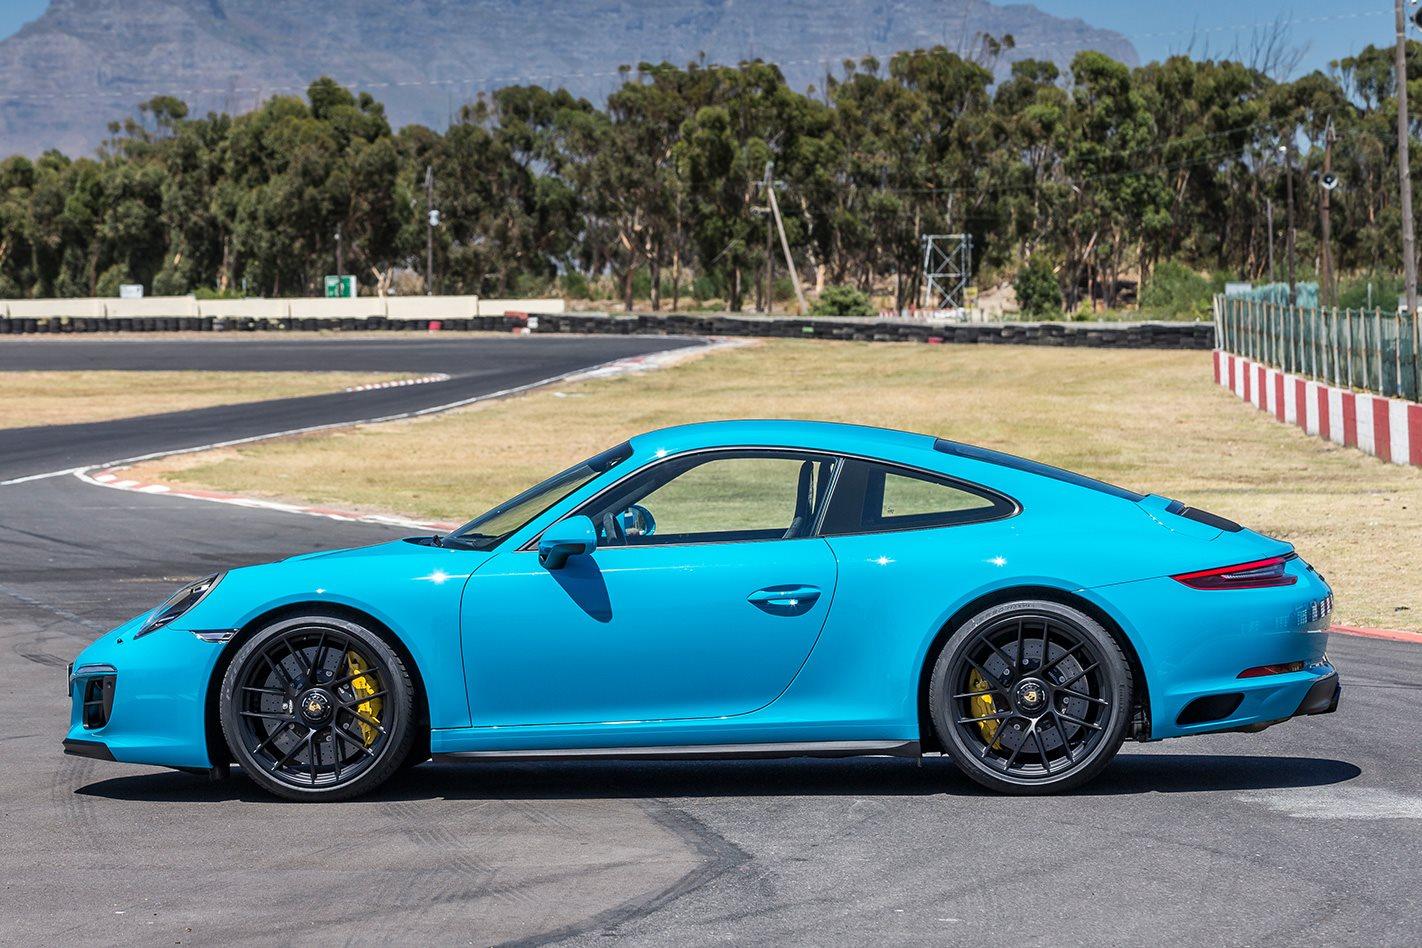 2017 Porsche 911 GTS side